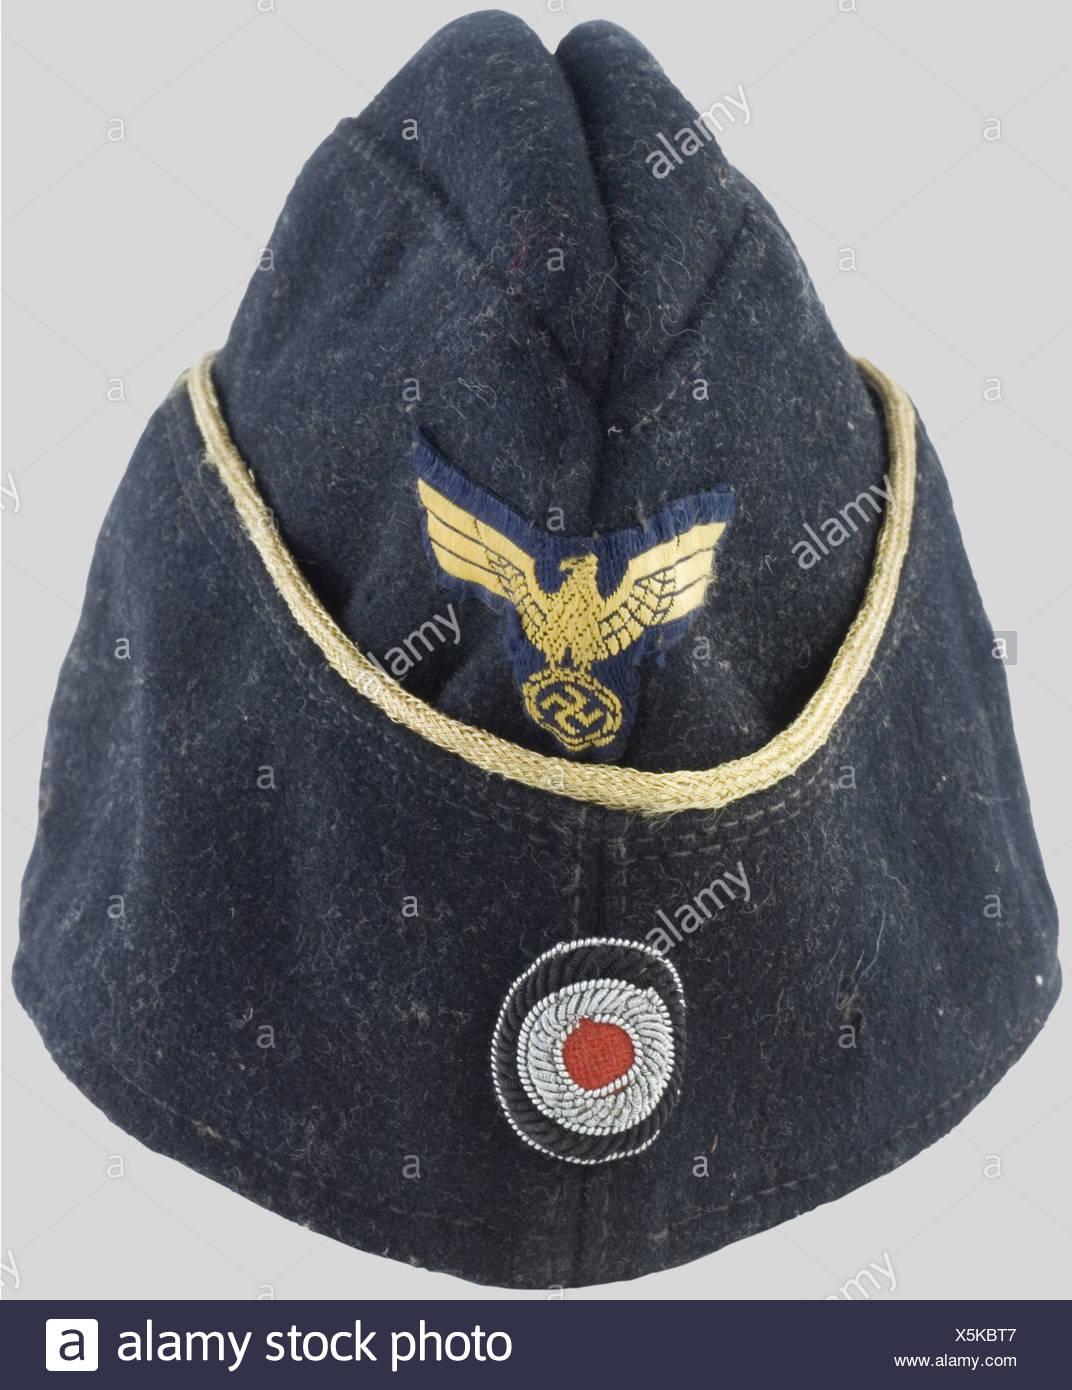 WW2 Repro Navy Side Cap Hat White Sailor Kriegsmarine EM NCO White Sidecap